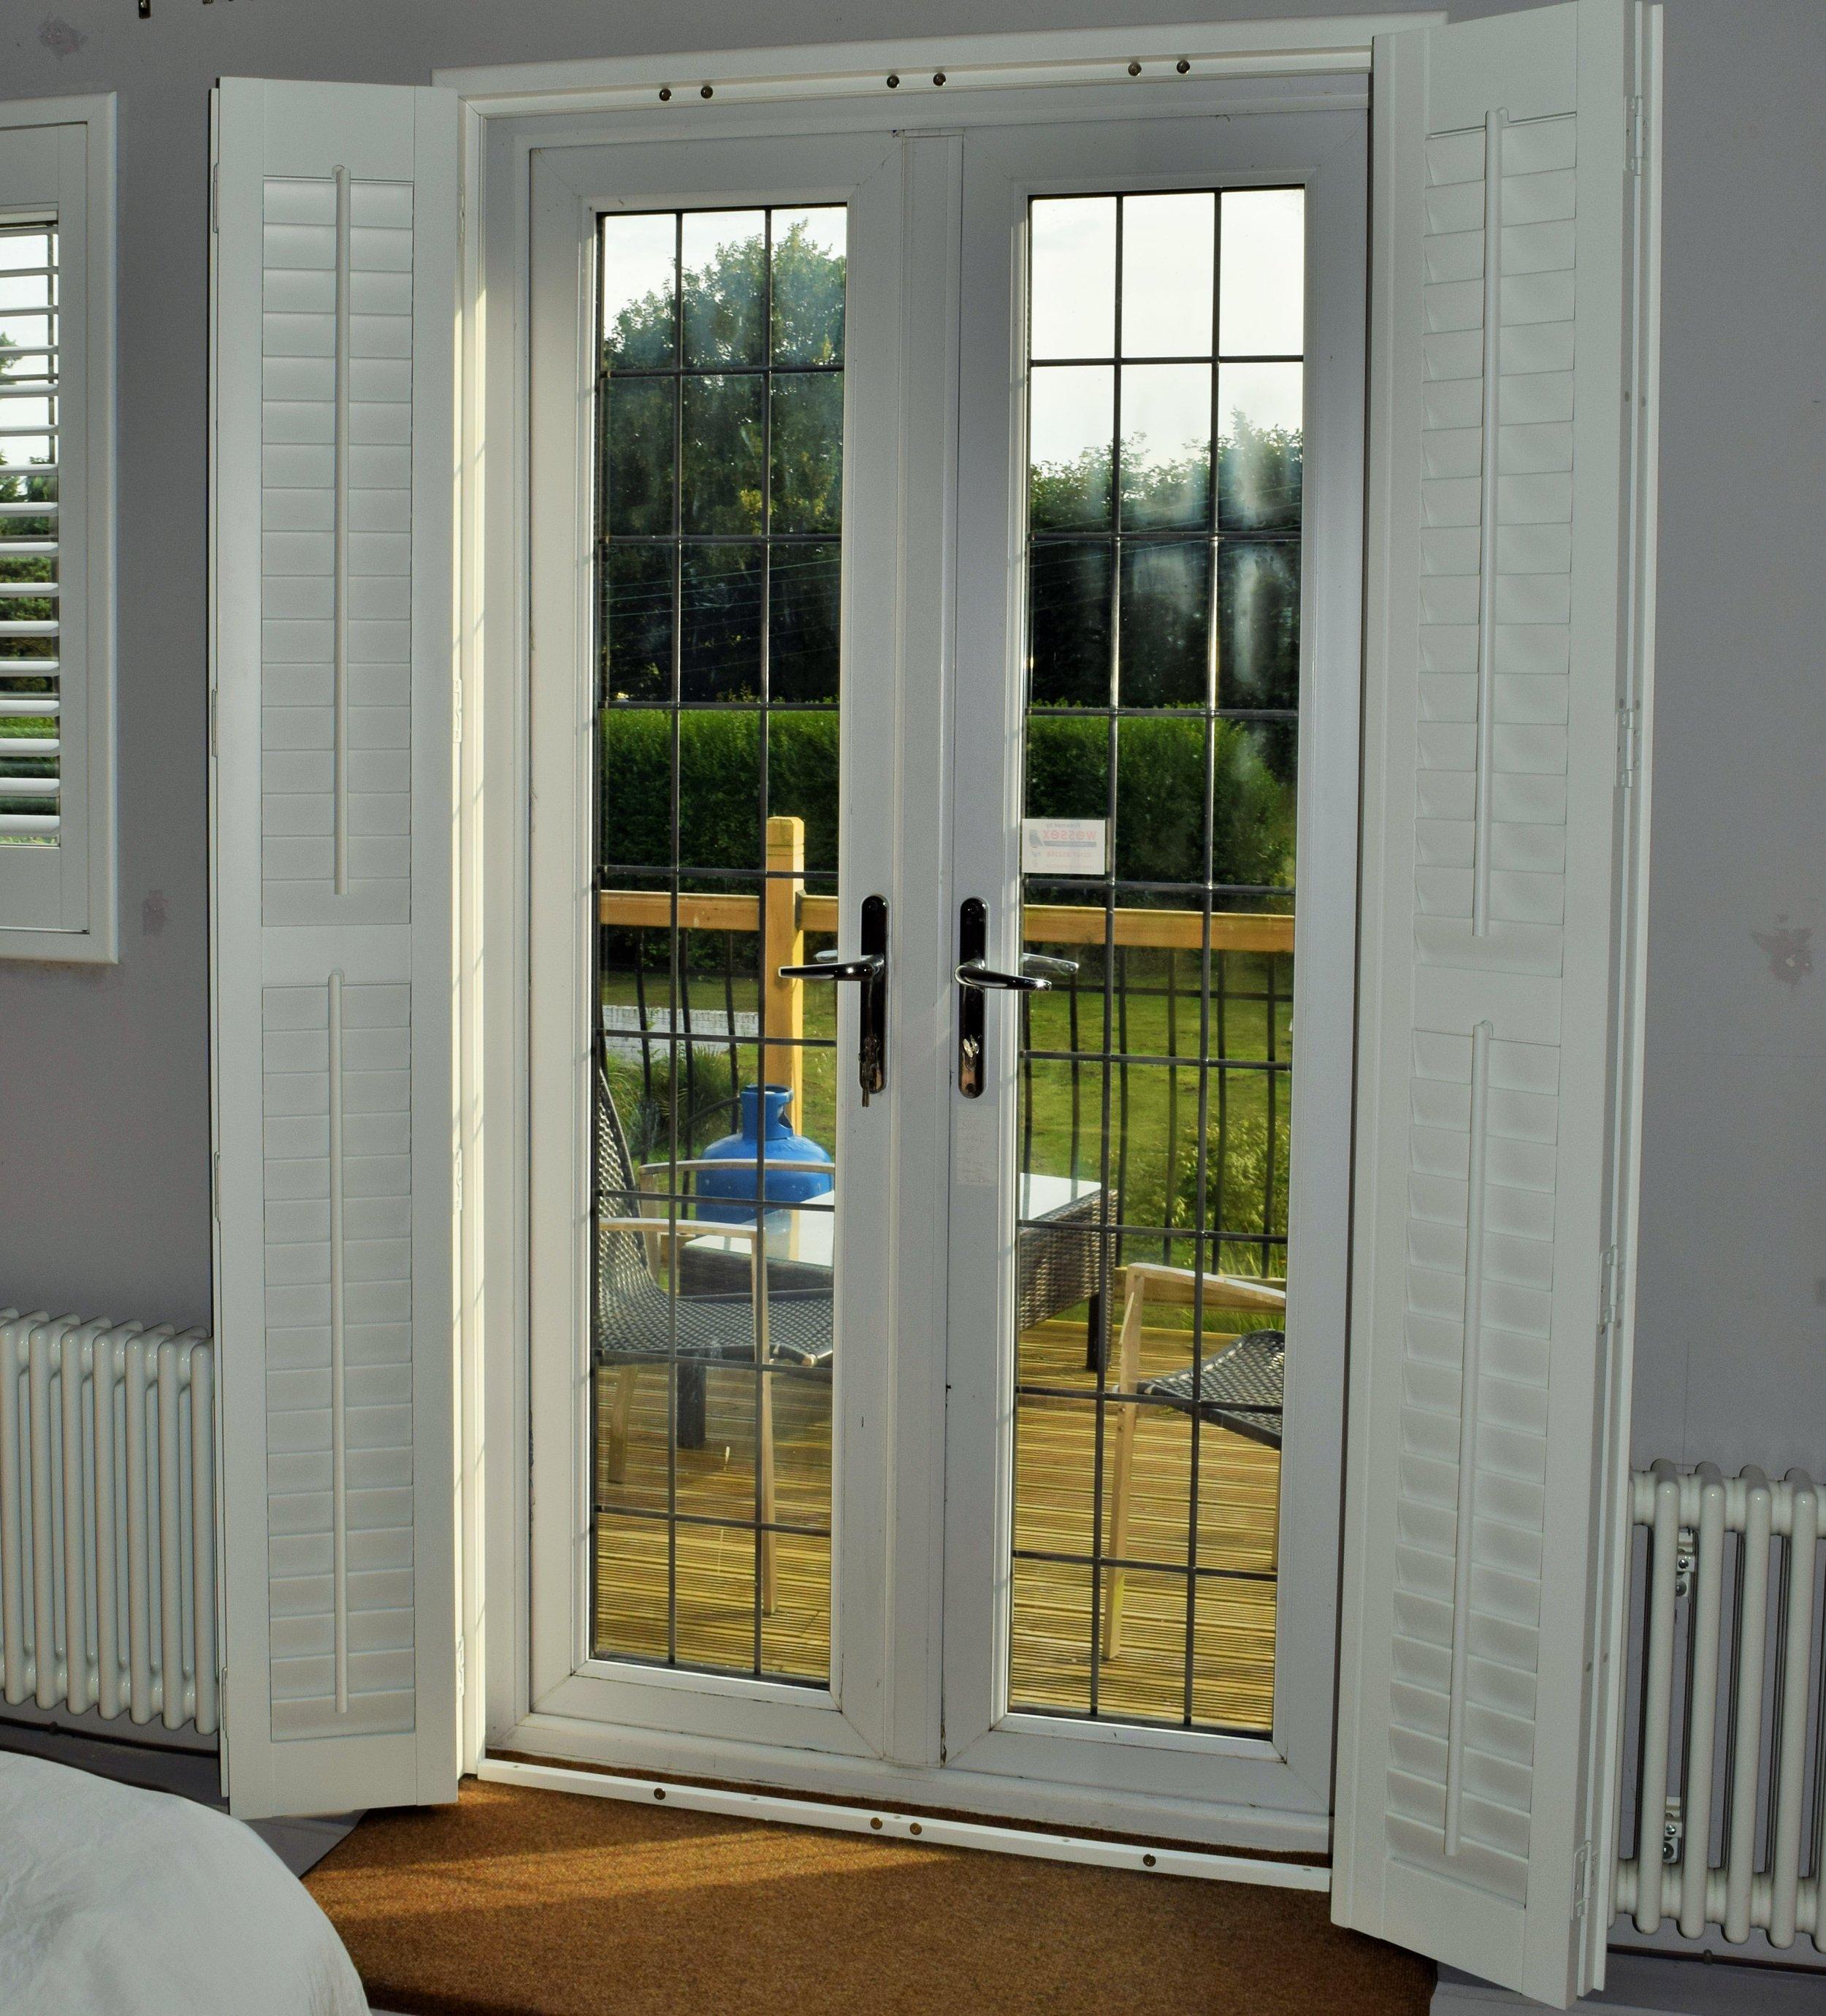 Patio door plantation shutters